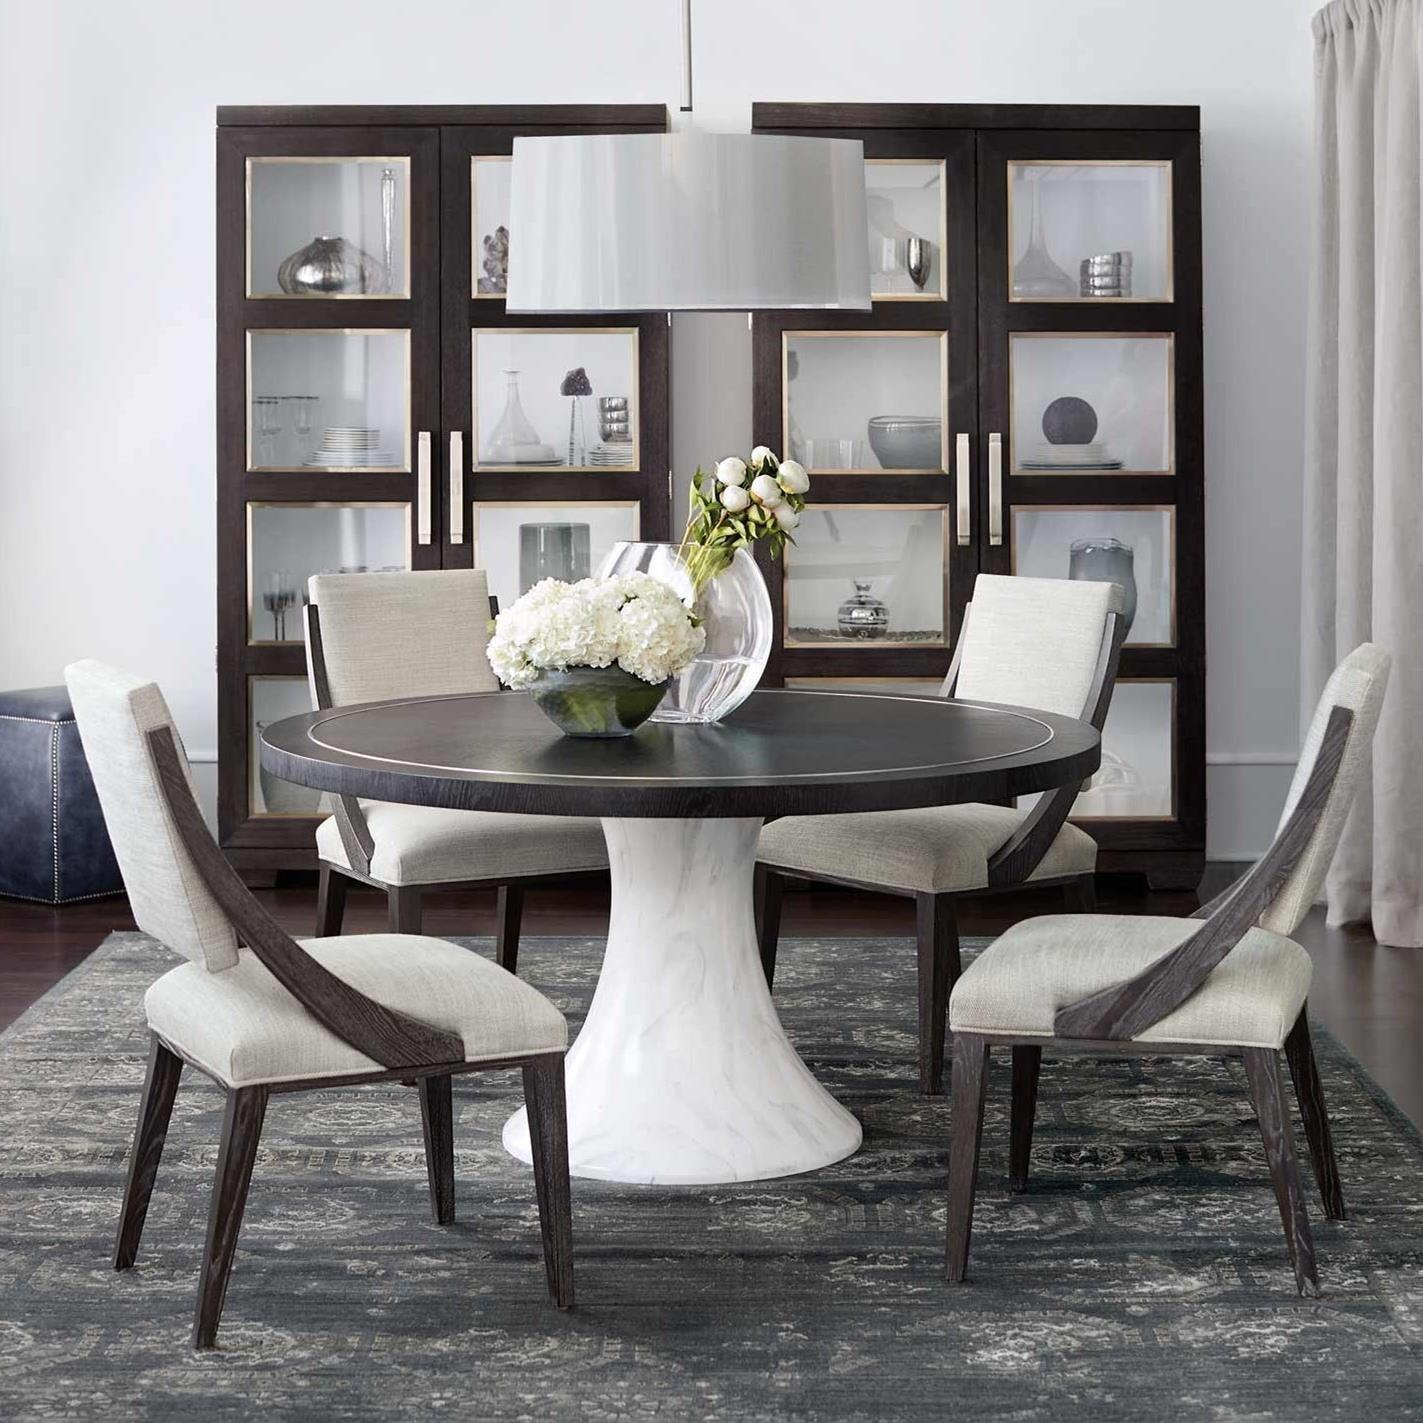 bernhardt decorage casual dining room group baer 39 s furniture casual dining room groups. Black Bedroom Furniture Sets. Home Design Ideas